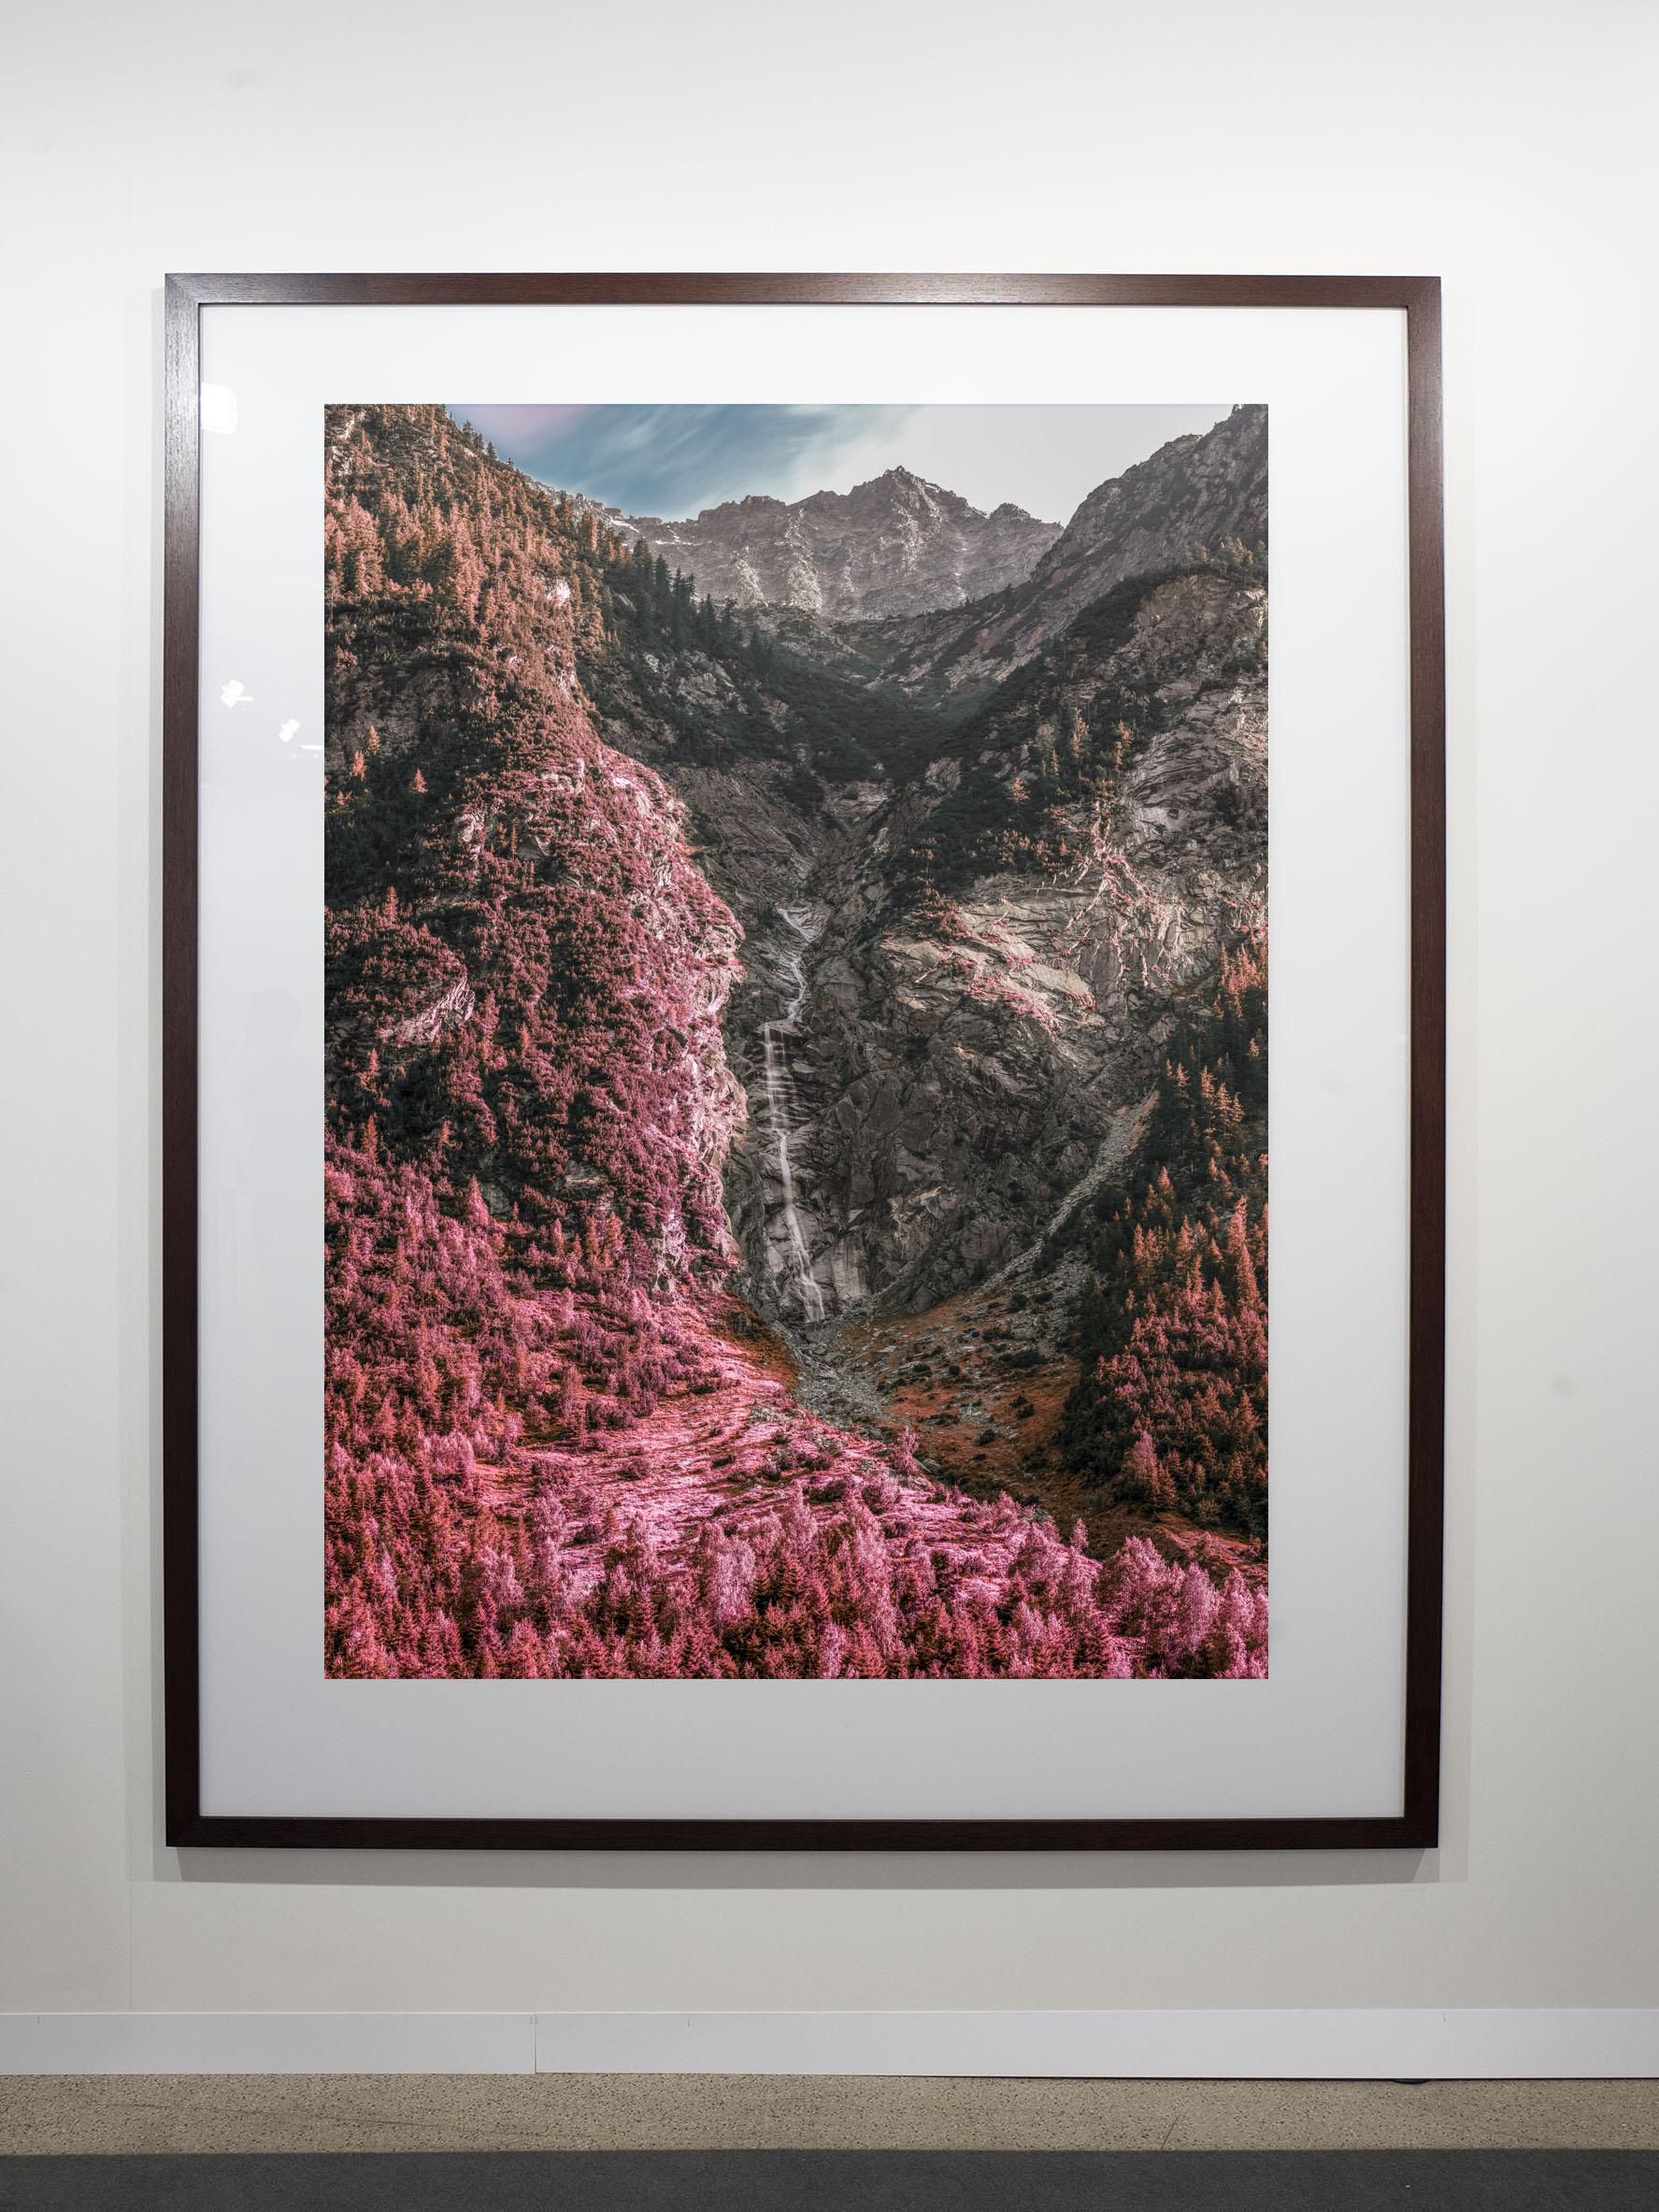 pink sustenpass by alexander palaciosL11